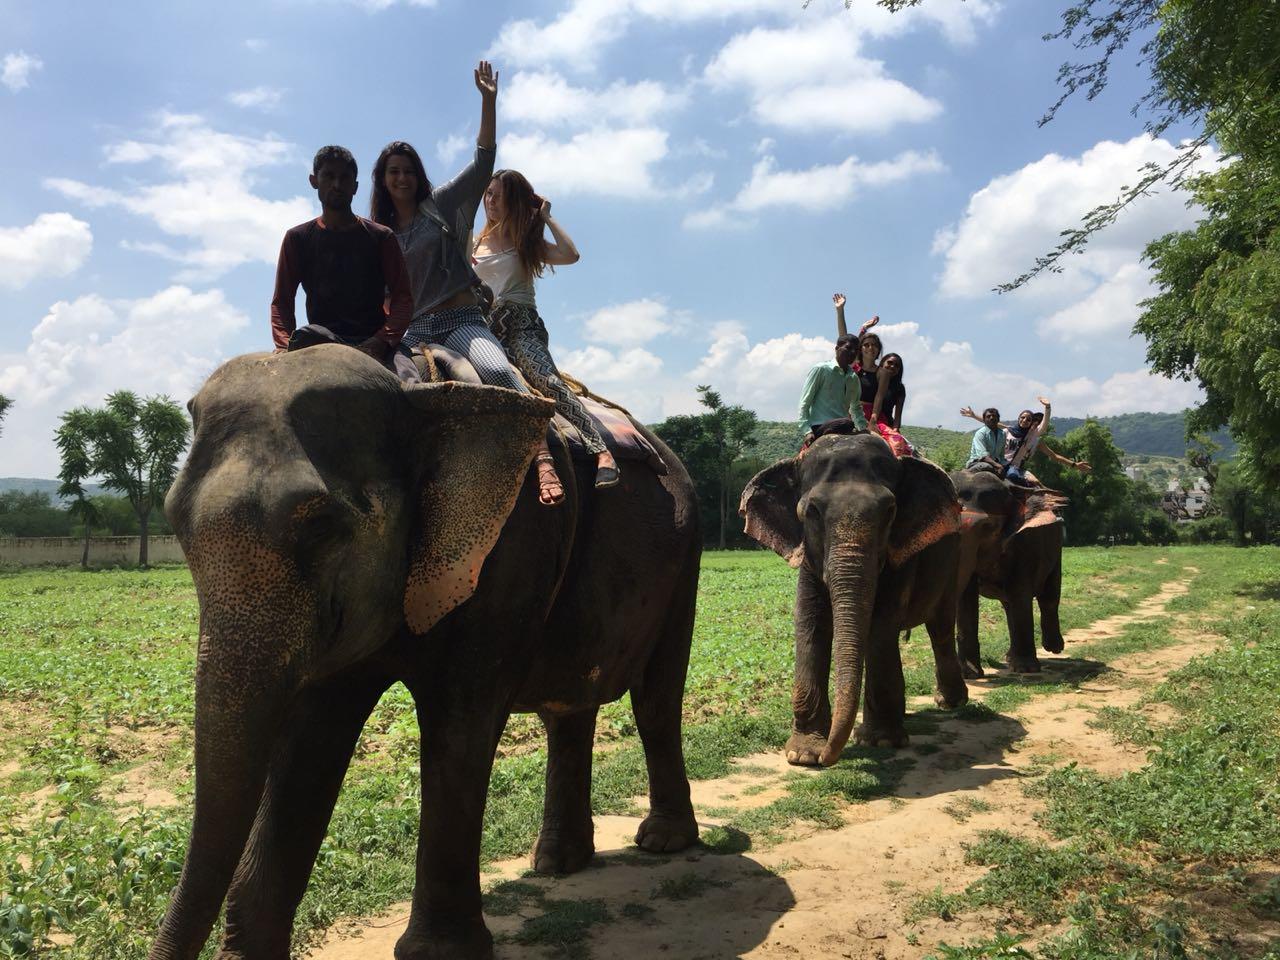 Gap Year Program - Social Travel: Volunteer in Jaipur  3